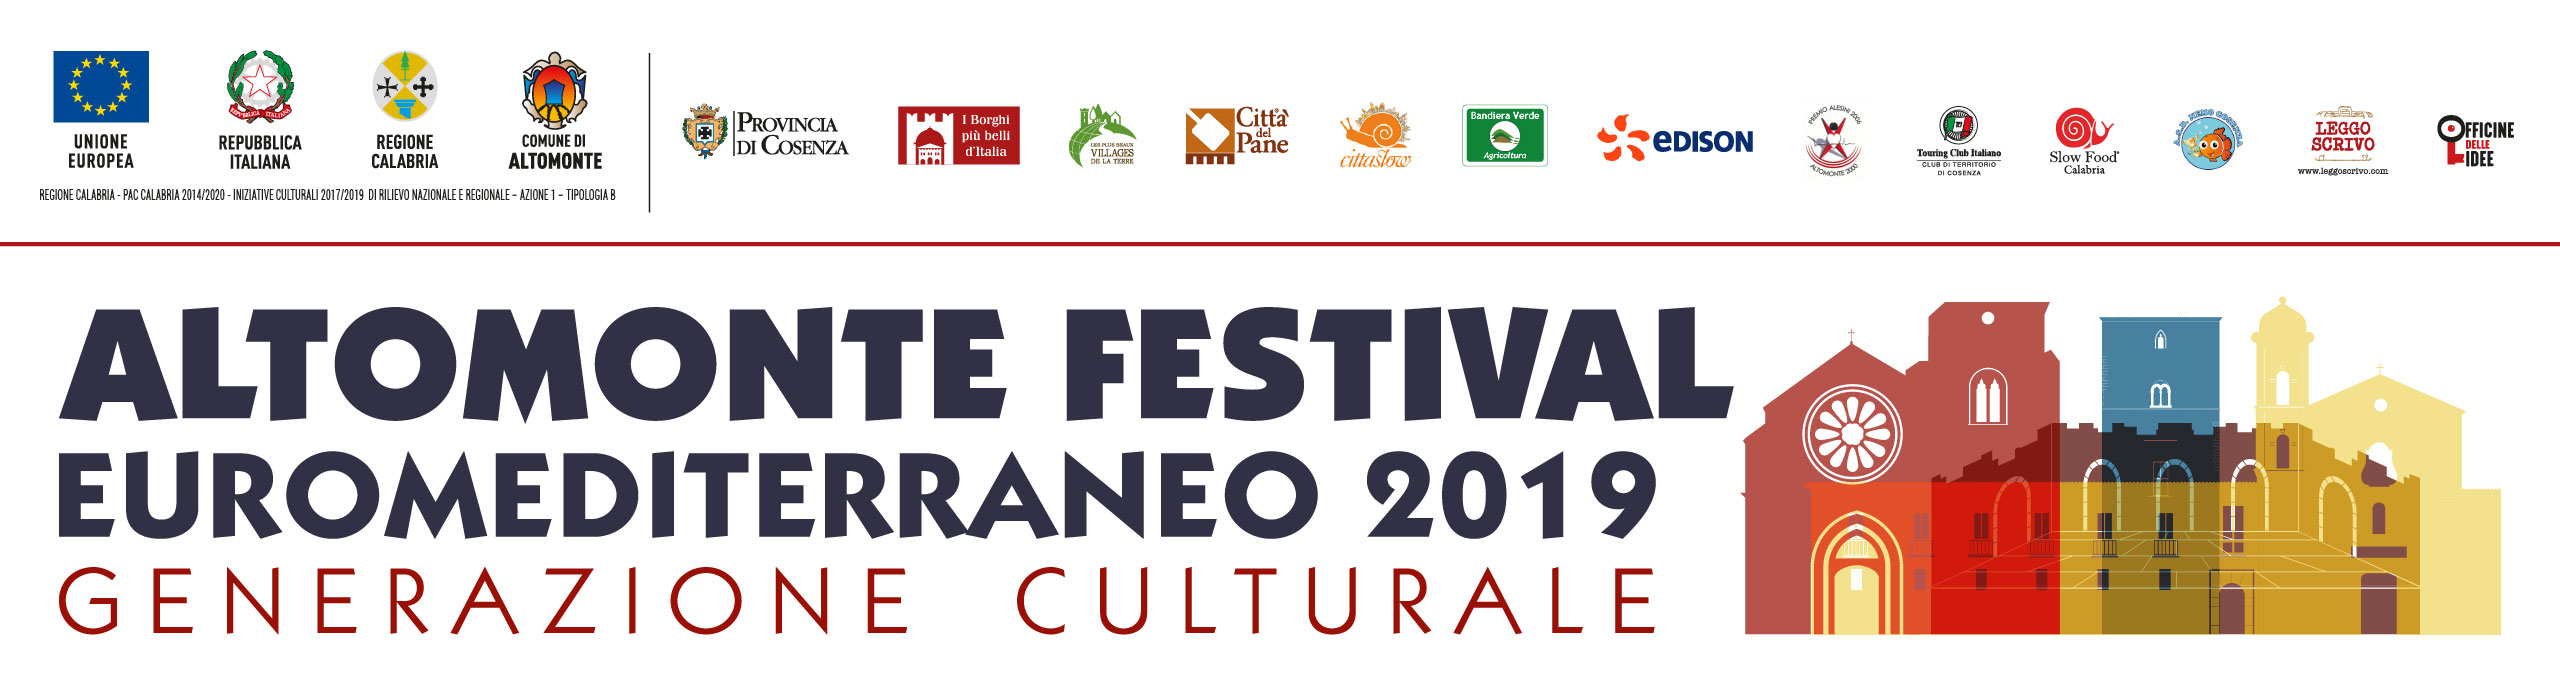 Altomonte Festival Euromediterraneo 2019